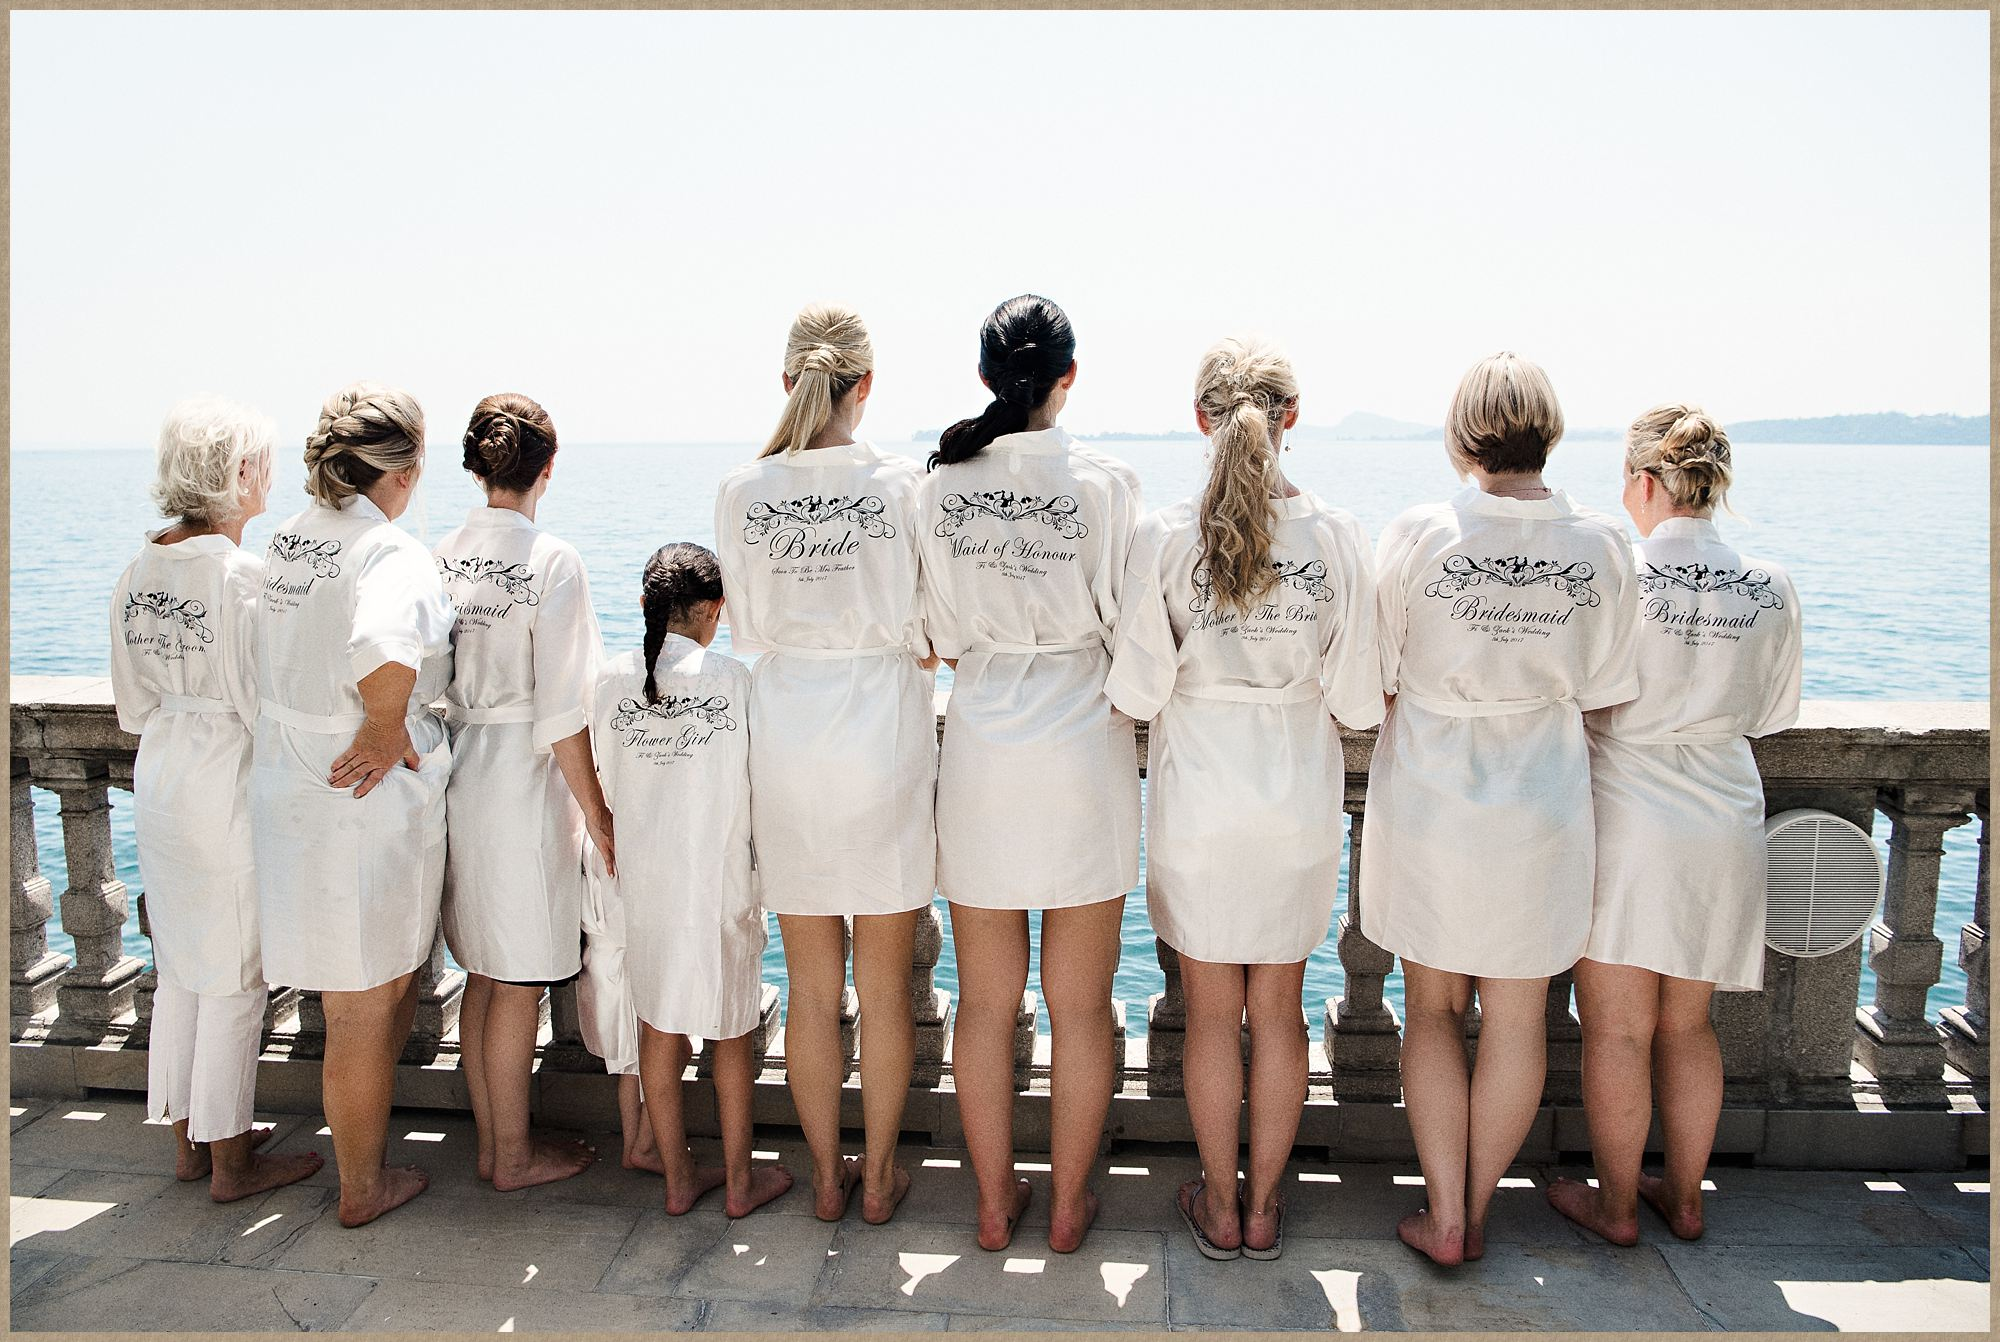 lake garda wedding photography at Isola del Garda, Italy